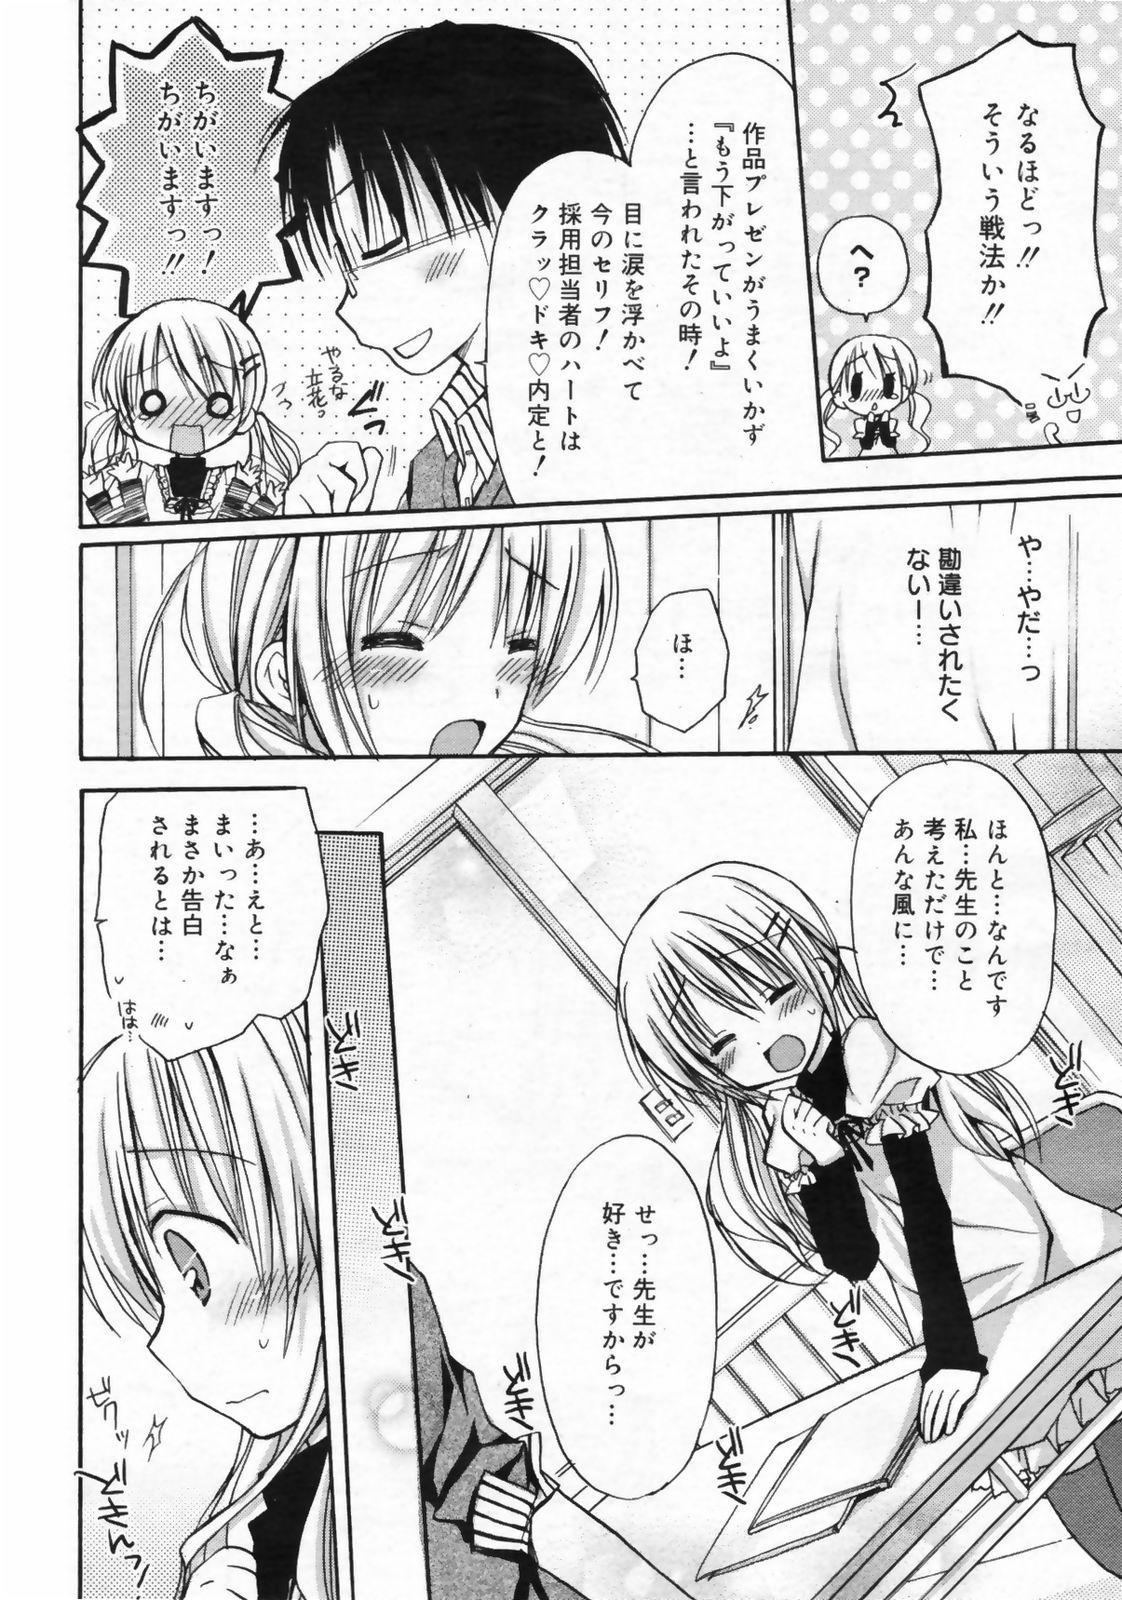 Manga Bangaichi 2009-02 Vol. 234 25